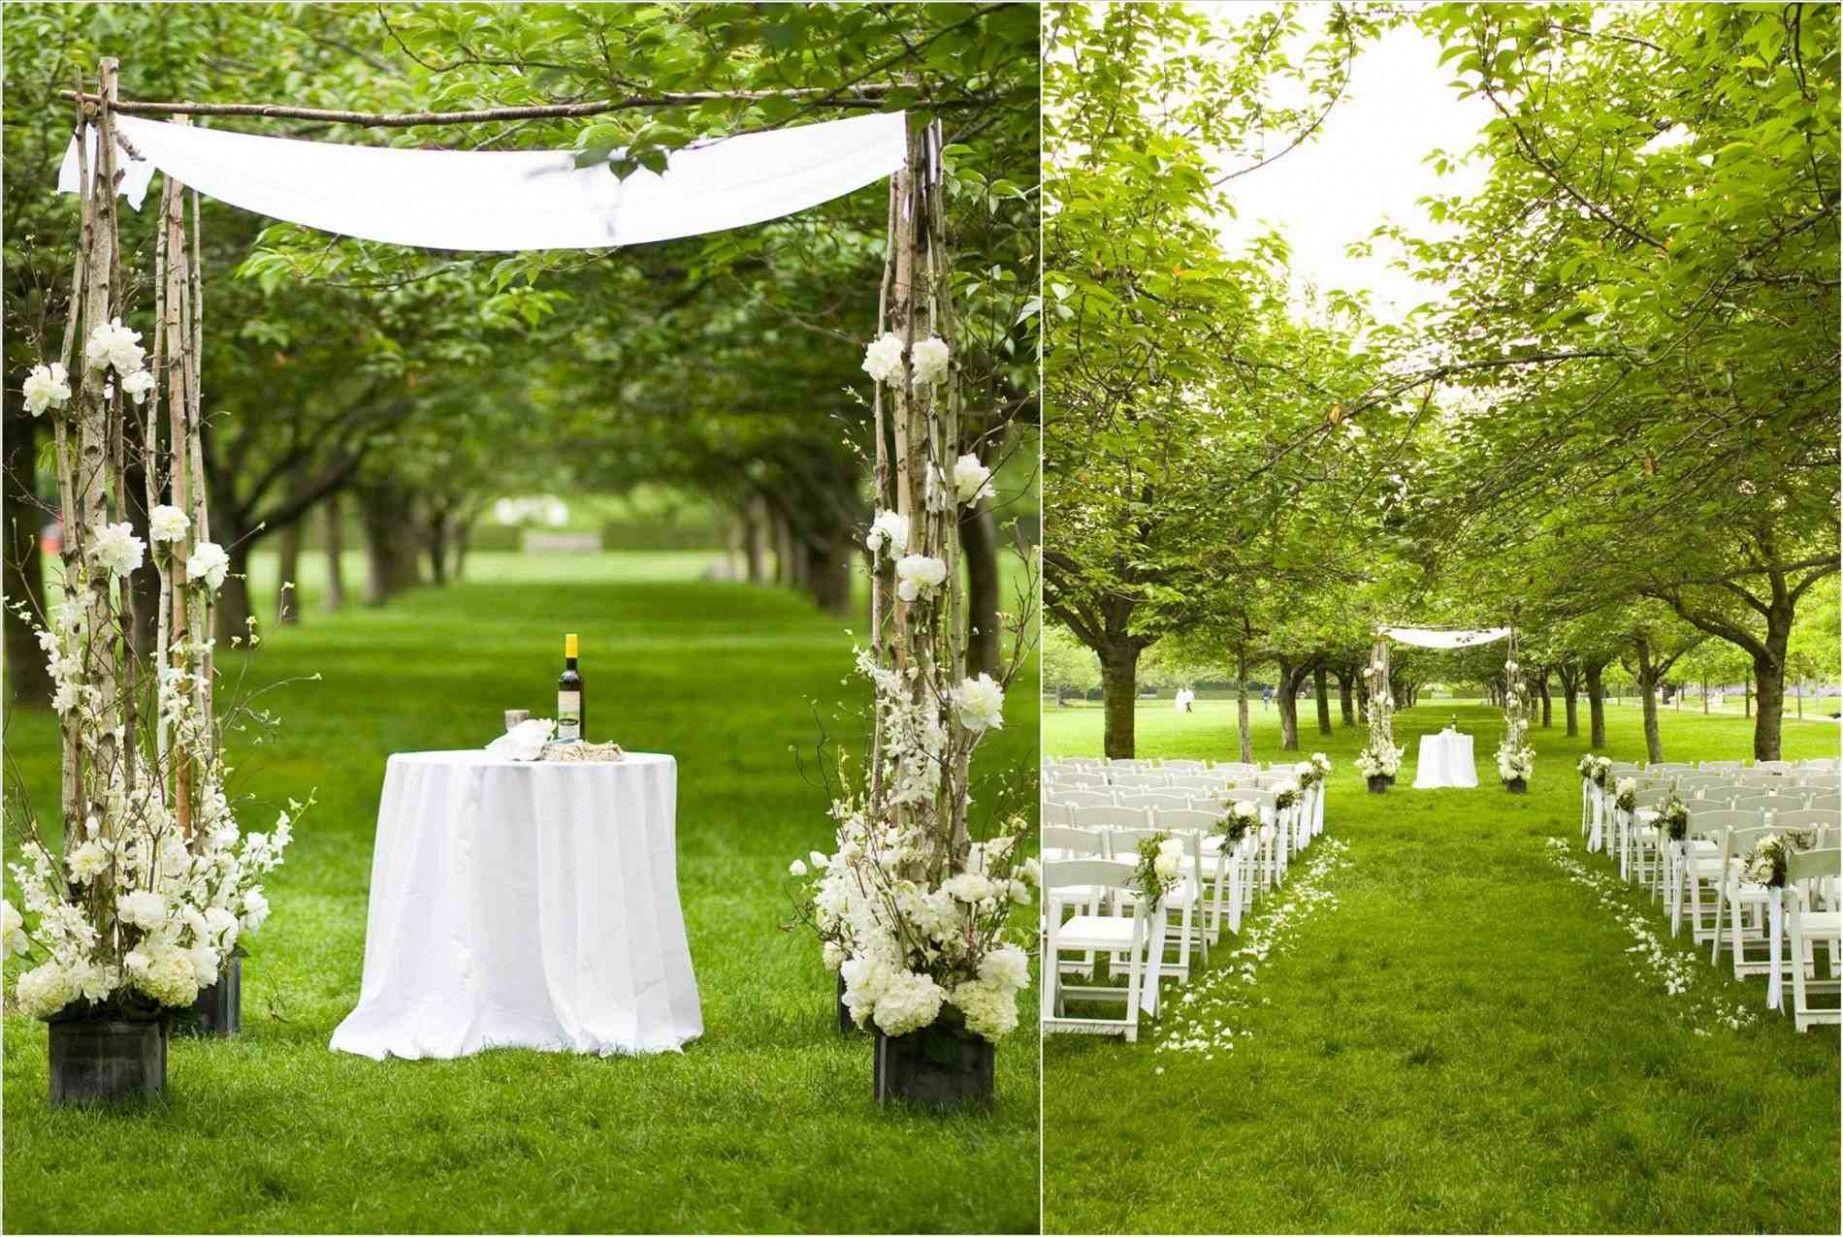 Simple Wedding Outdoor Reception Ideas Wedding Ceremony Decorations Outdoor Wedding Themes Outdoor Cheap Wedding Reception